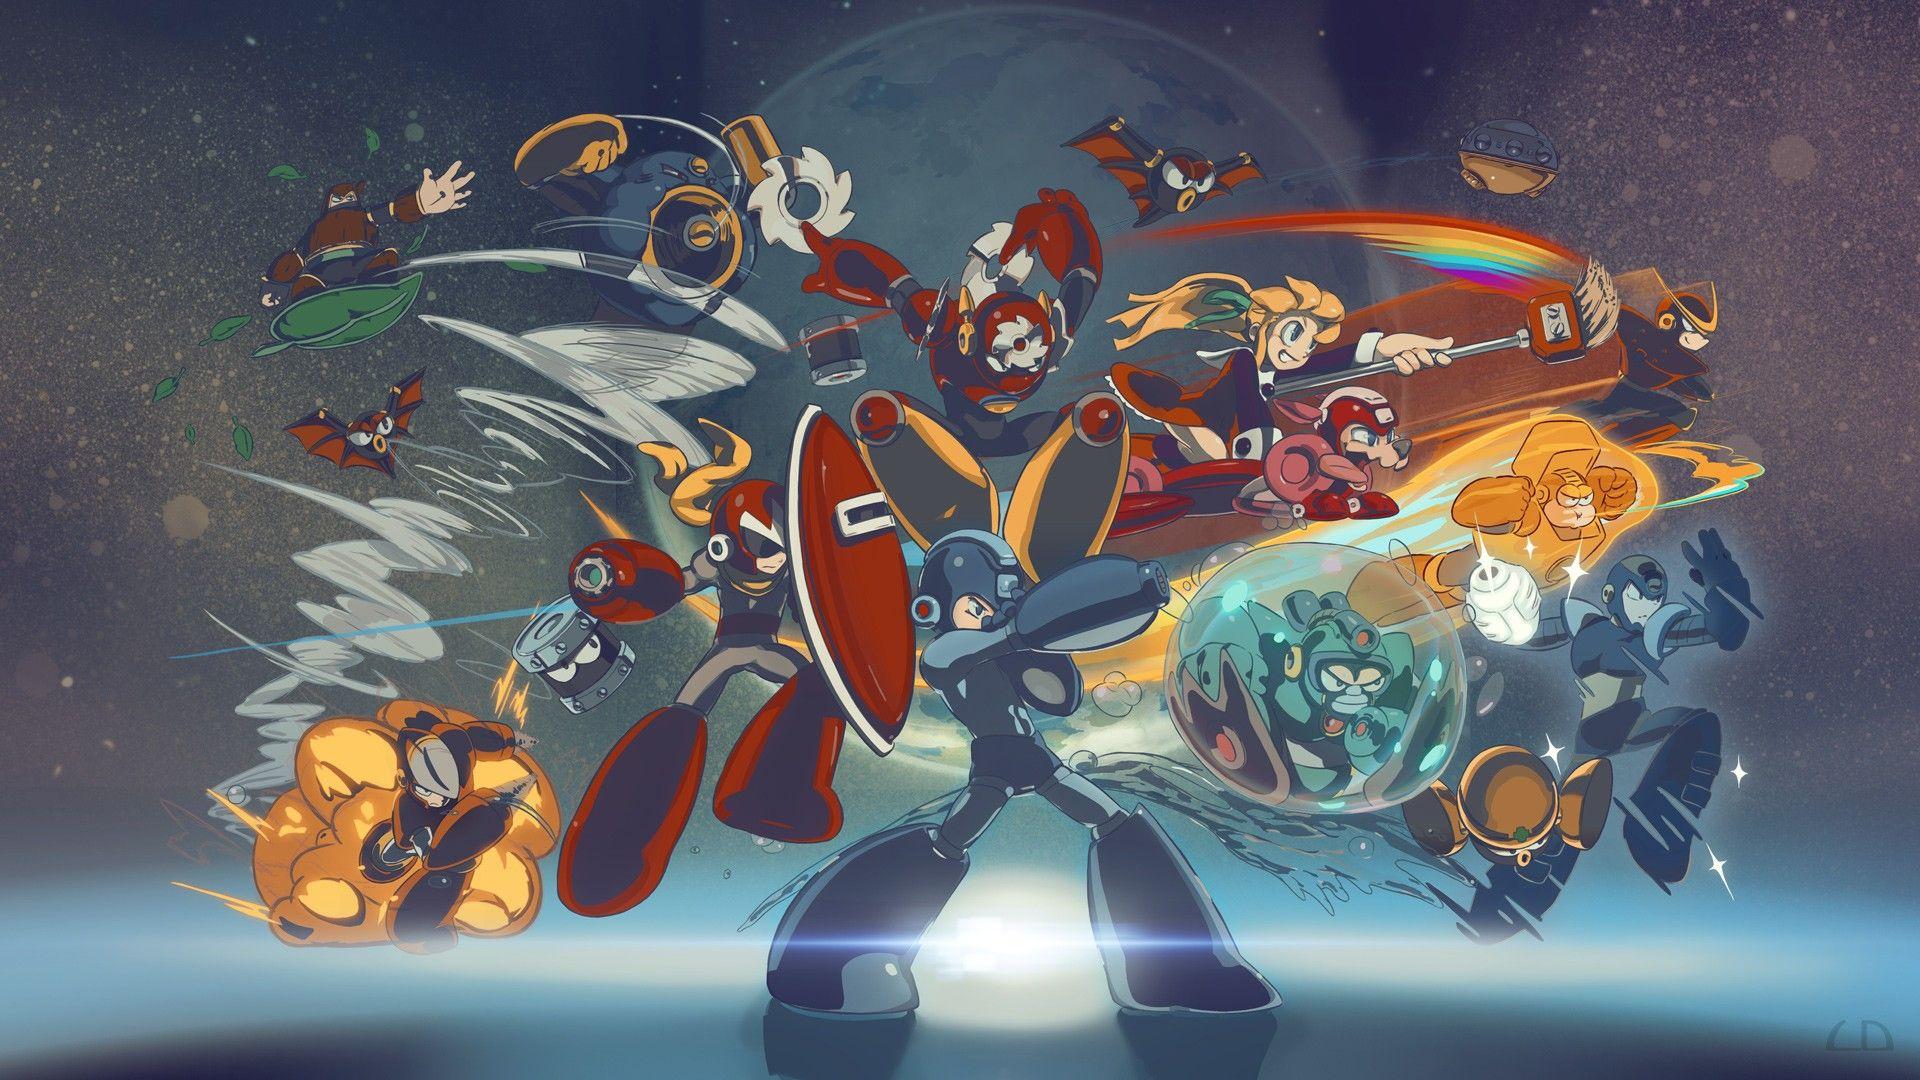 Video Game Mega Man Hd Wallpapers Desktop Backgrounds Mobile 640 1136 Mega Man Iphone Wallpaper 28 Wallpapers Ado Mega Man Retro Gaming Art Man Wallpaper